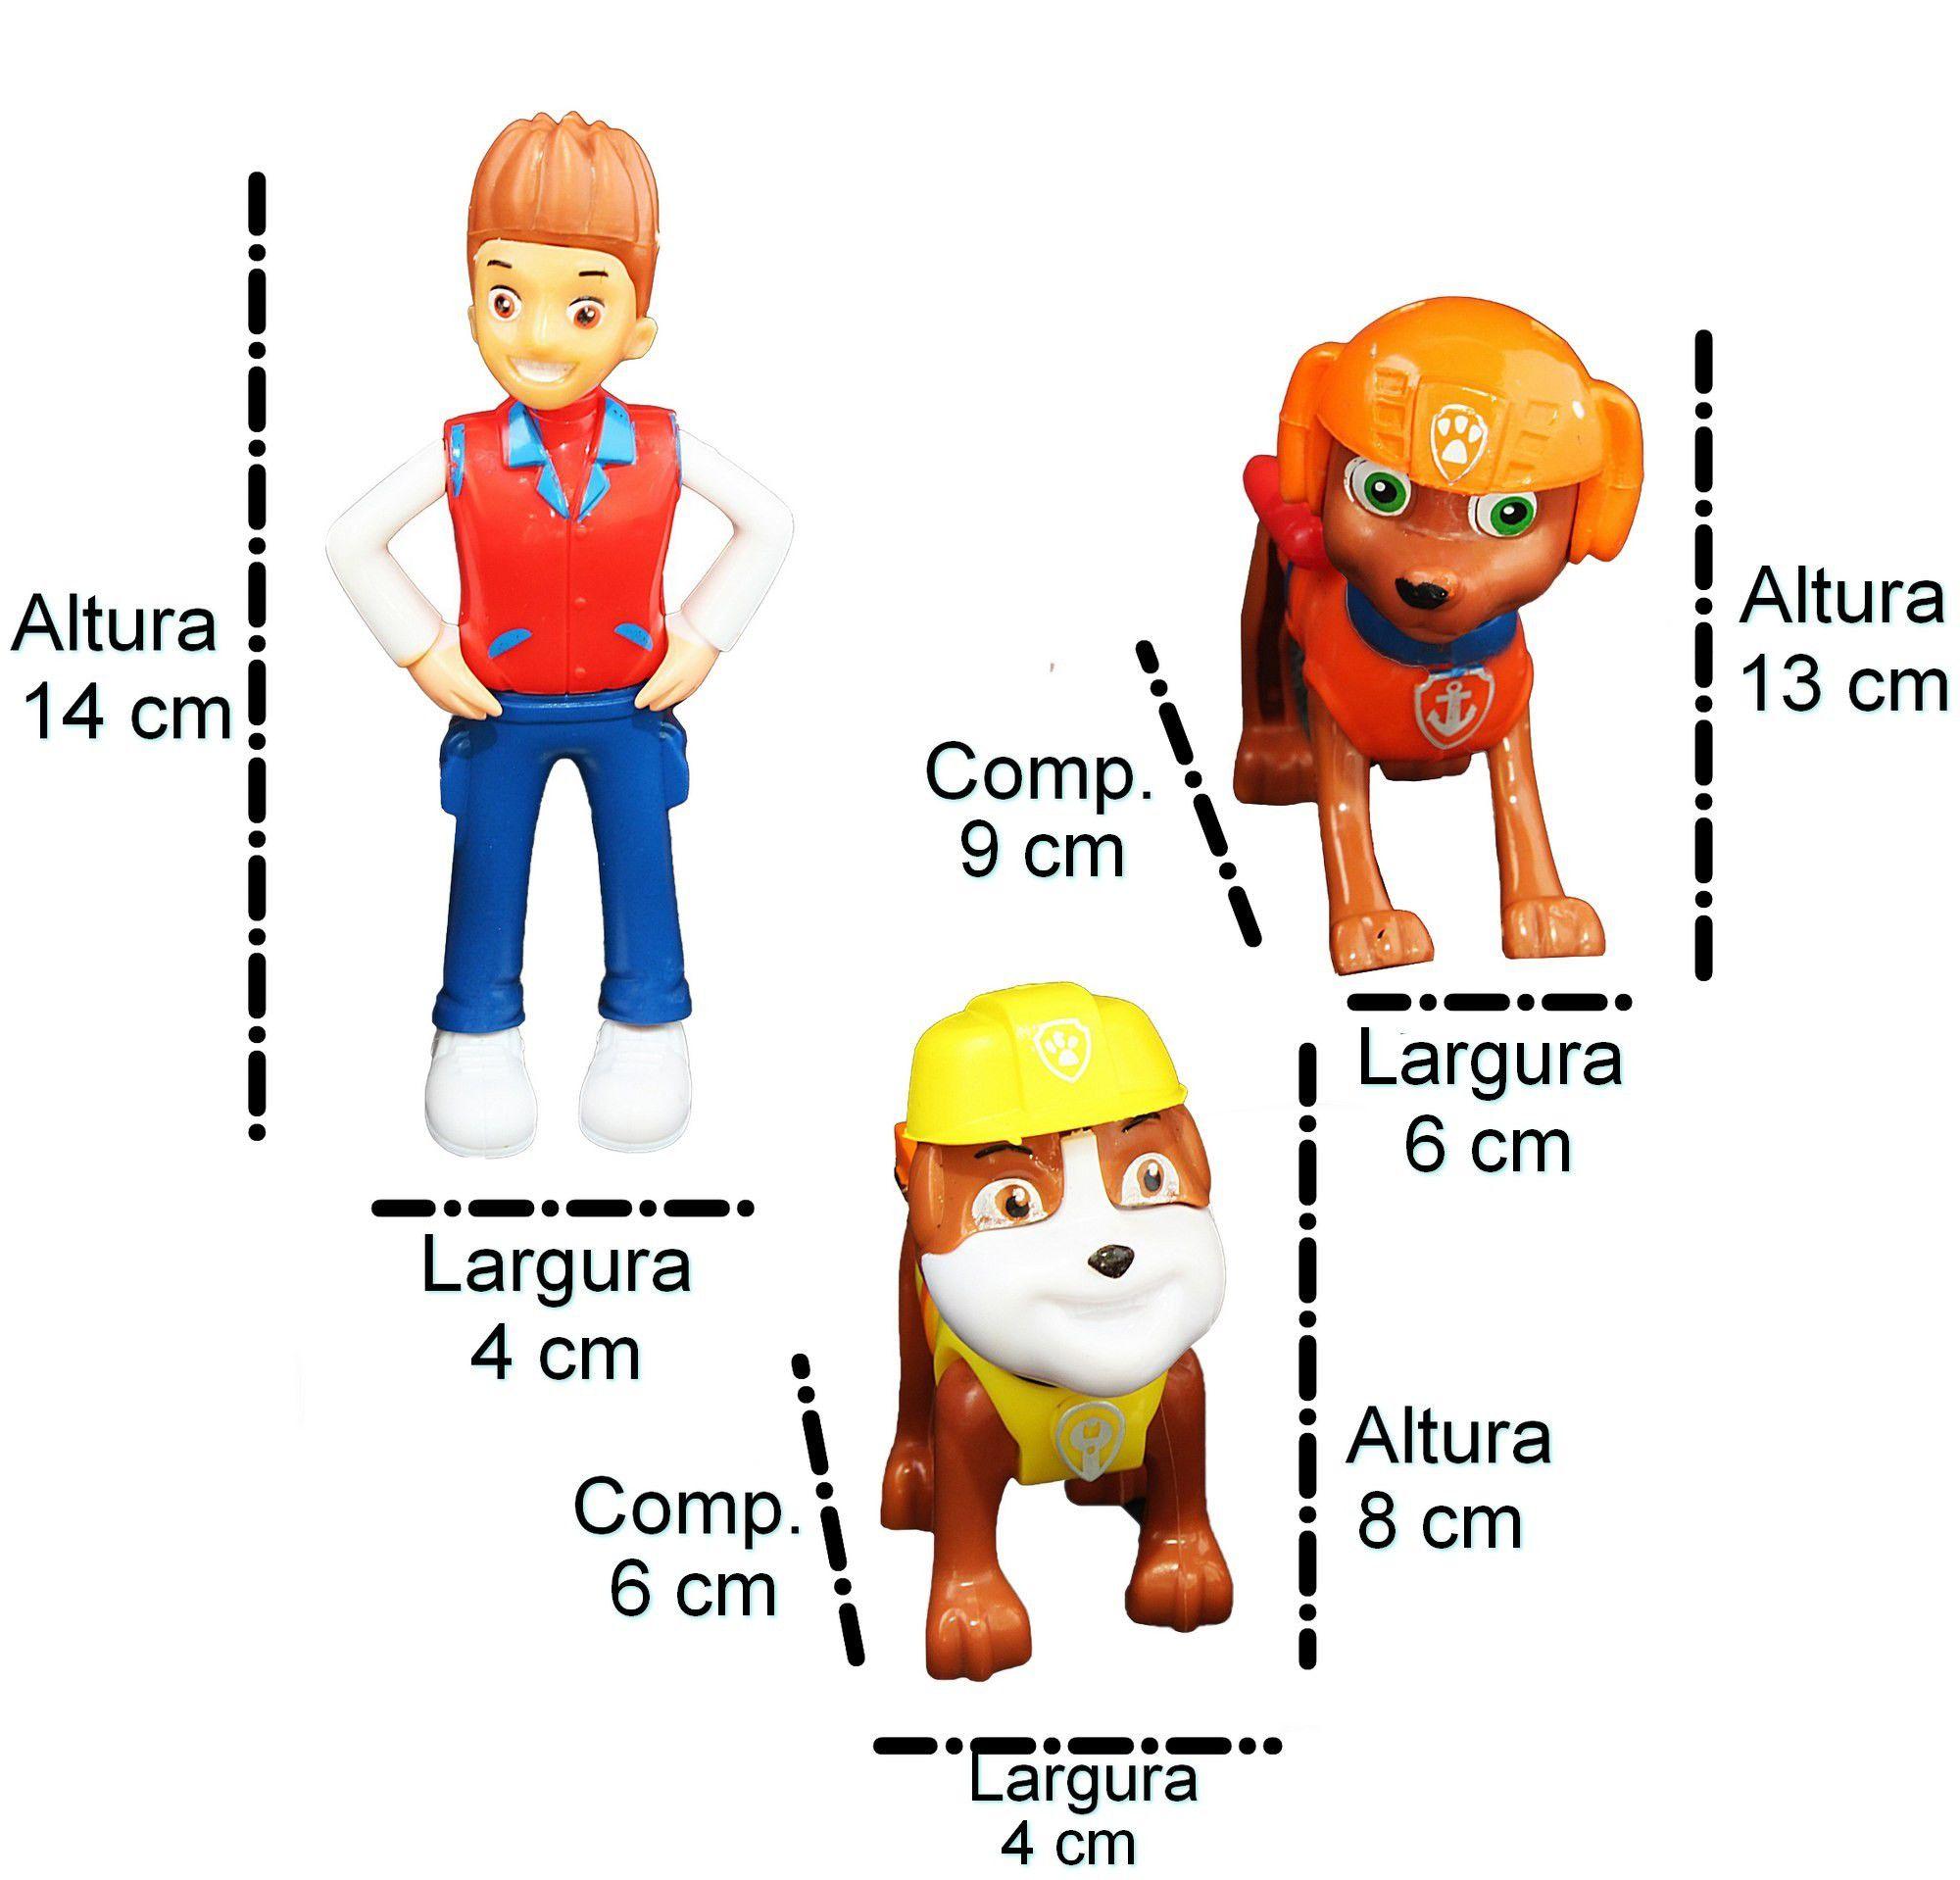 Kit Patrulha Canina Bonecos Personagens Carrinho Infantil